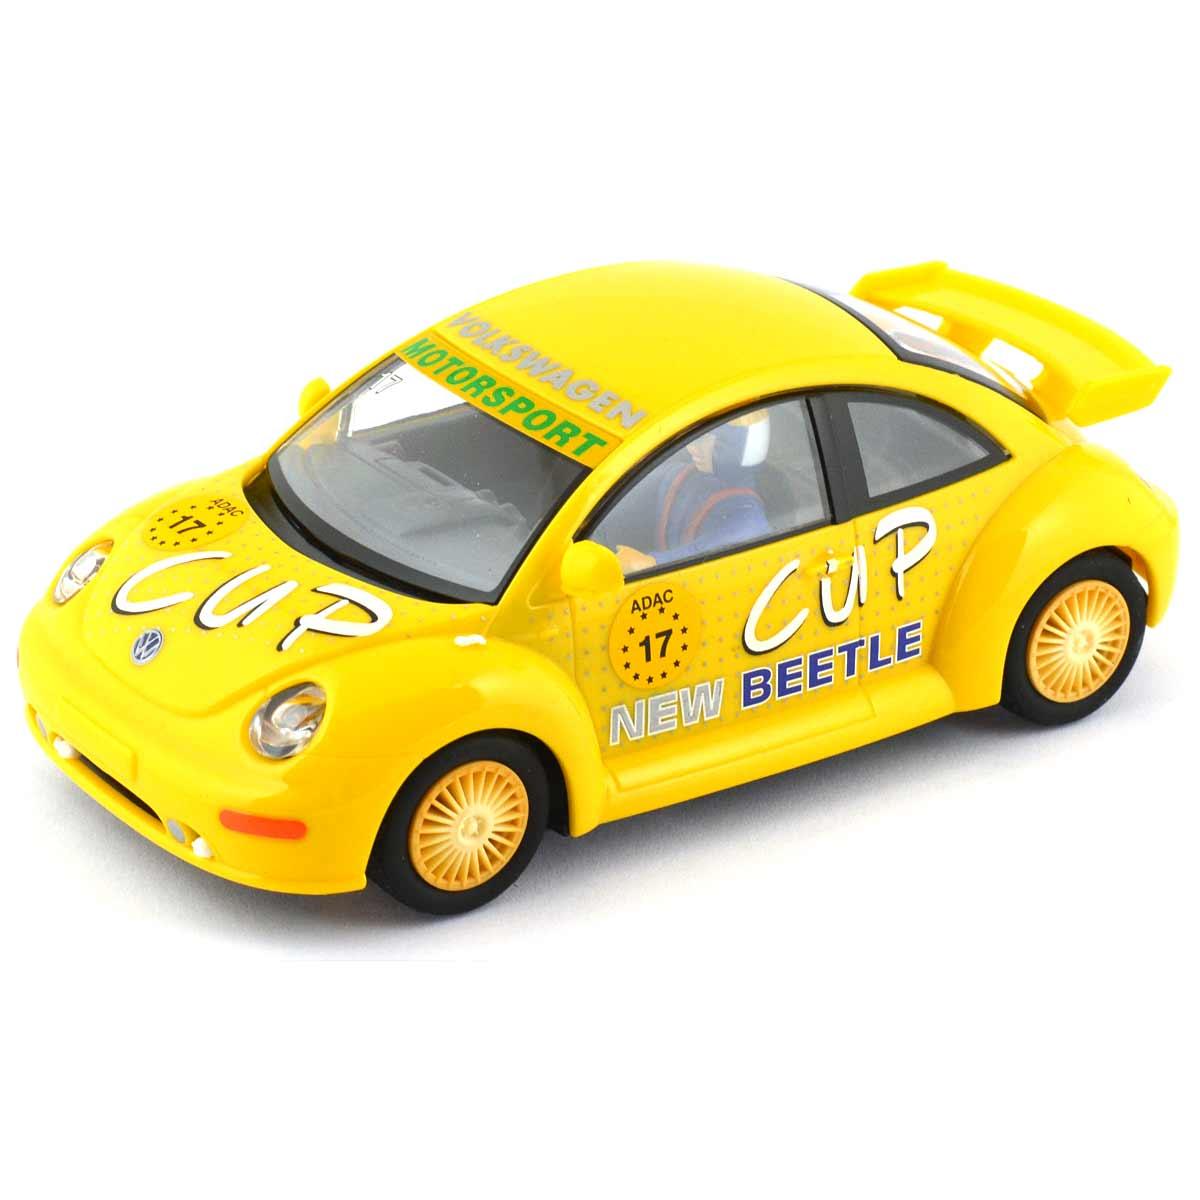 Vw Beetle Body Parts Uk: Scalextric VW Beetle No.3 Pirelli (C2233